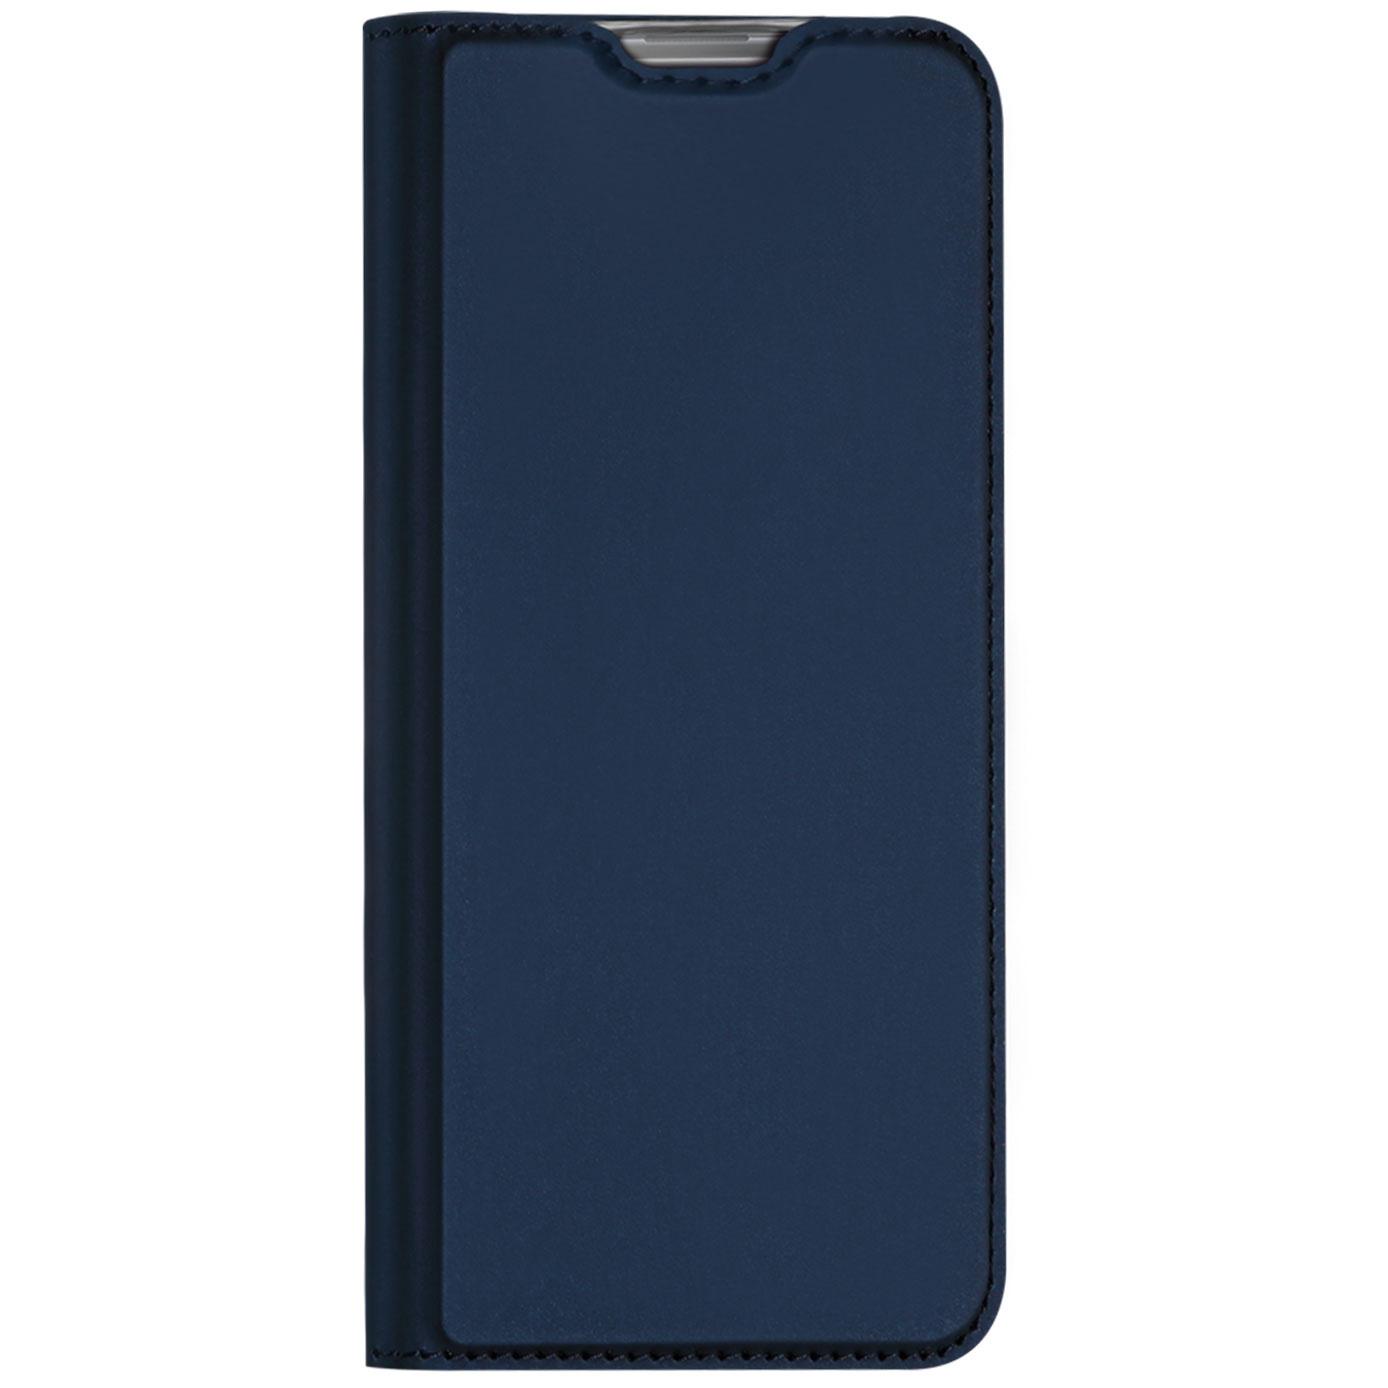 Dux Ducis Slim Softcase Booktype Samsung Galaxy Note 10 Lite - Blauw